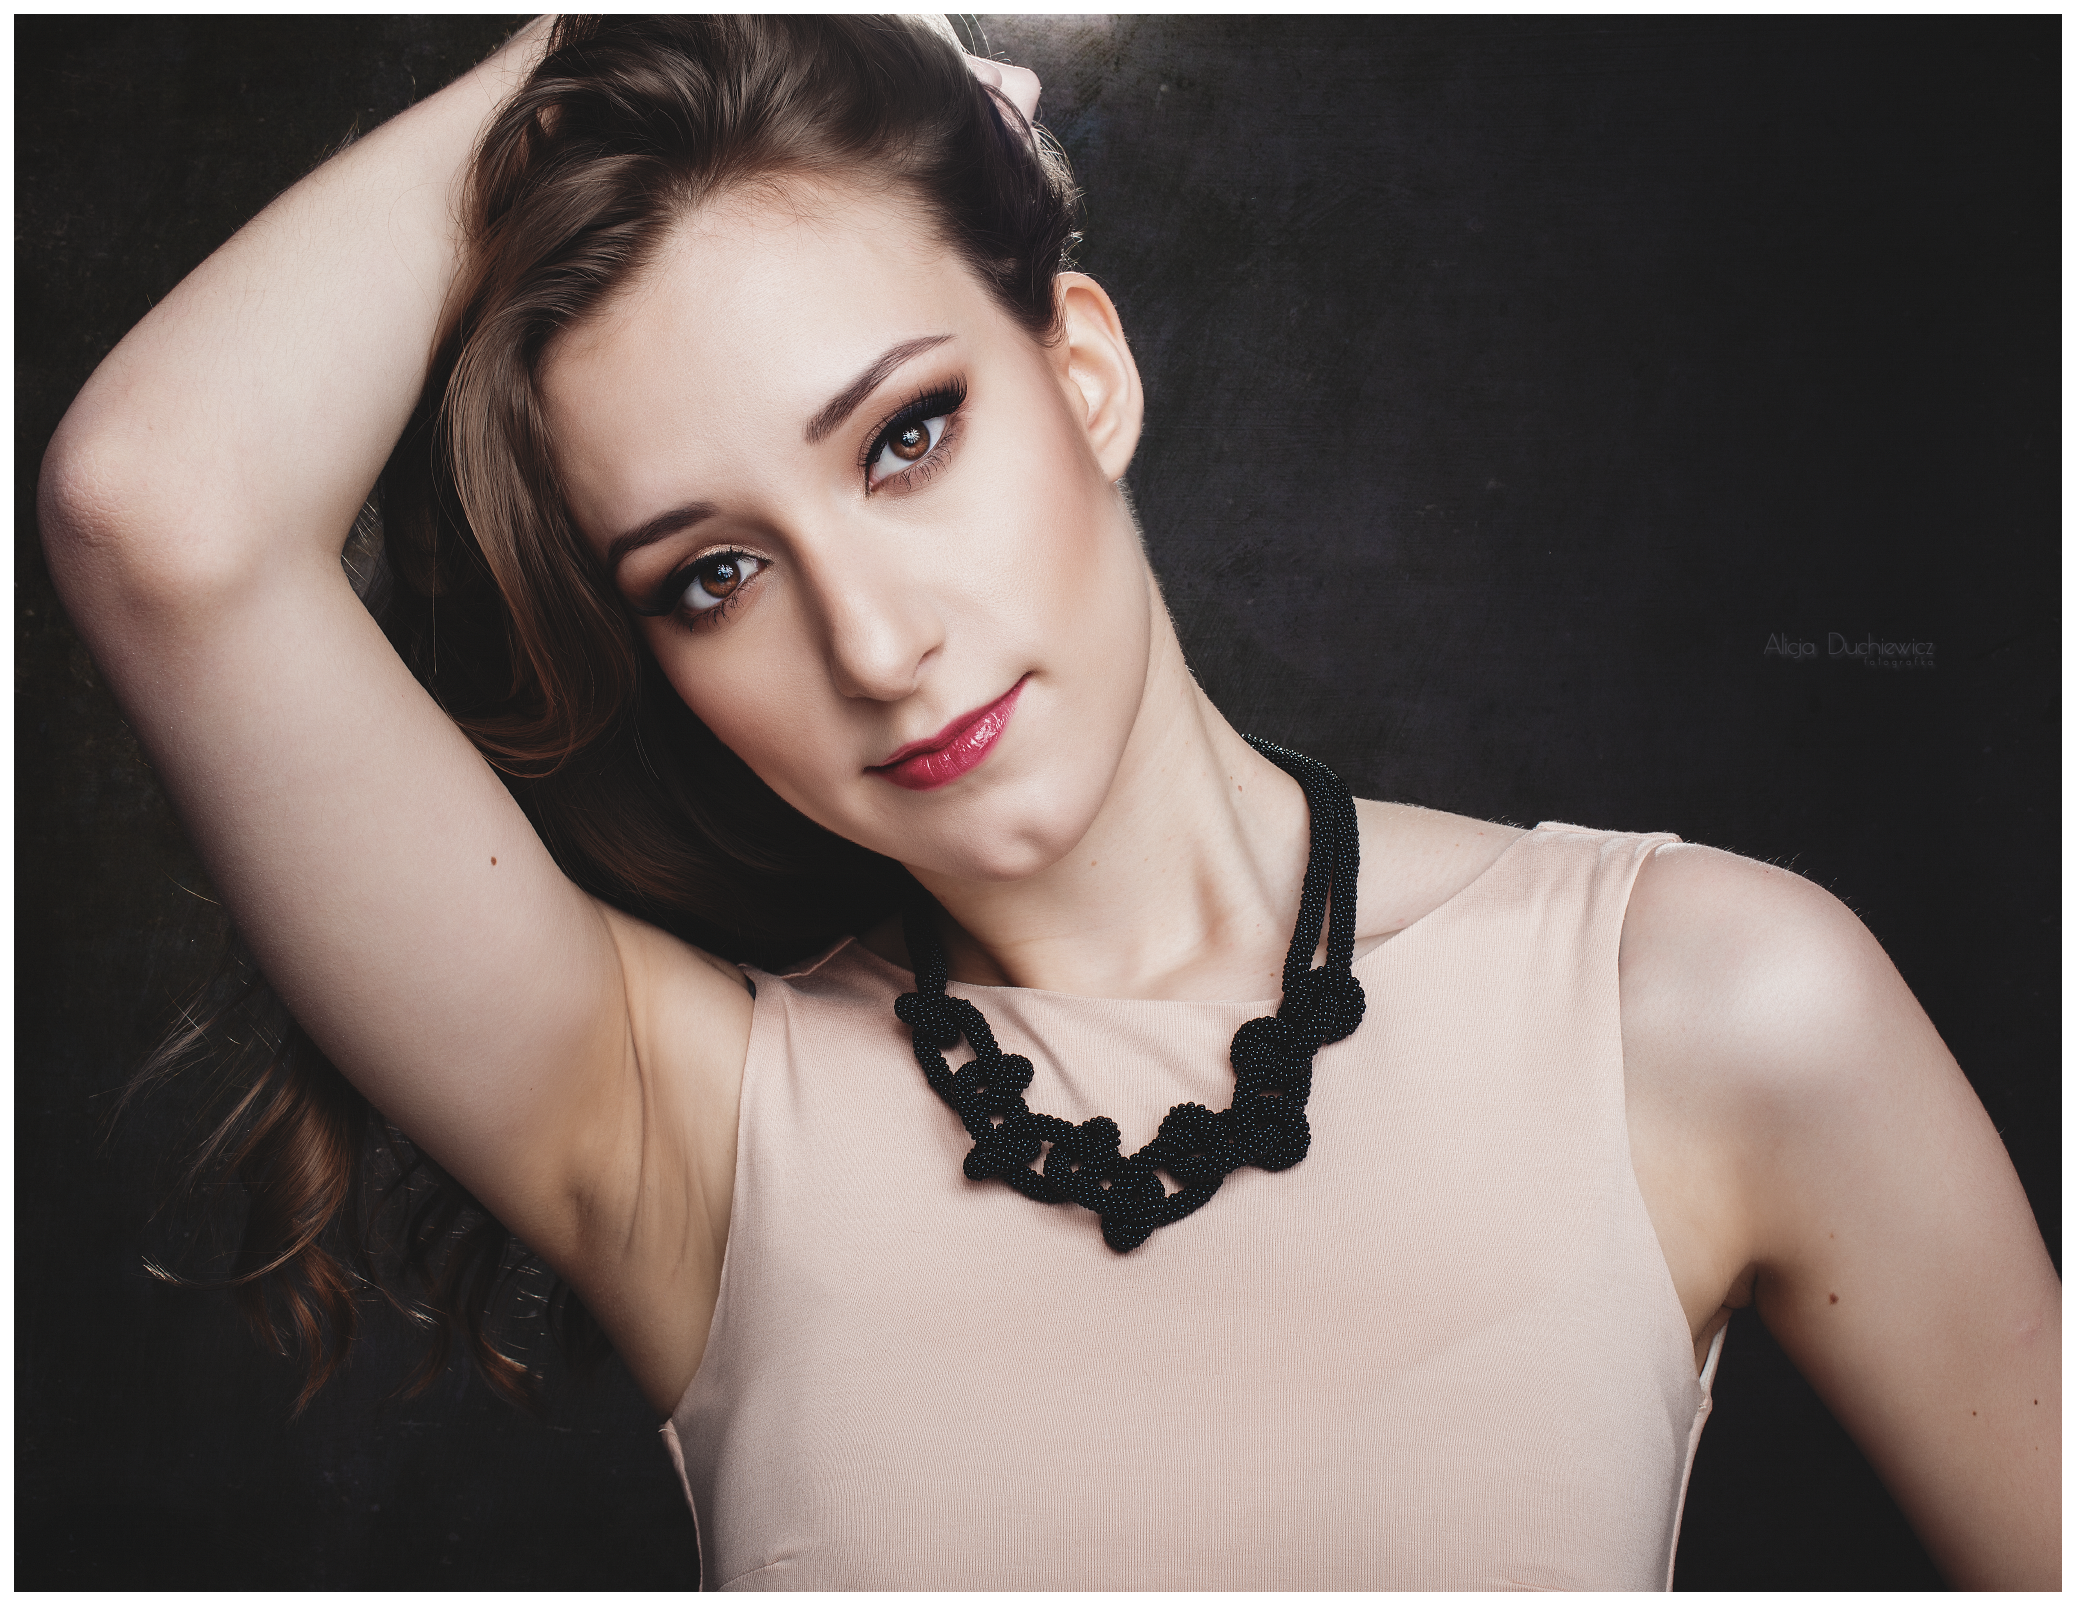 beautiful, beauty, black necklace, color #eyes #female #girl #hair #light #model #portrait #pretty #sexy #studio #studio session #stunning #women